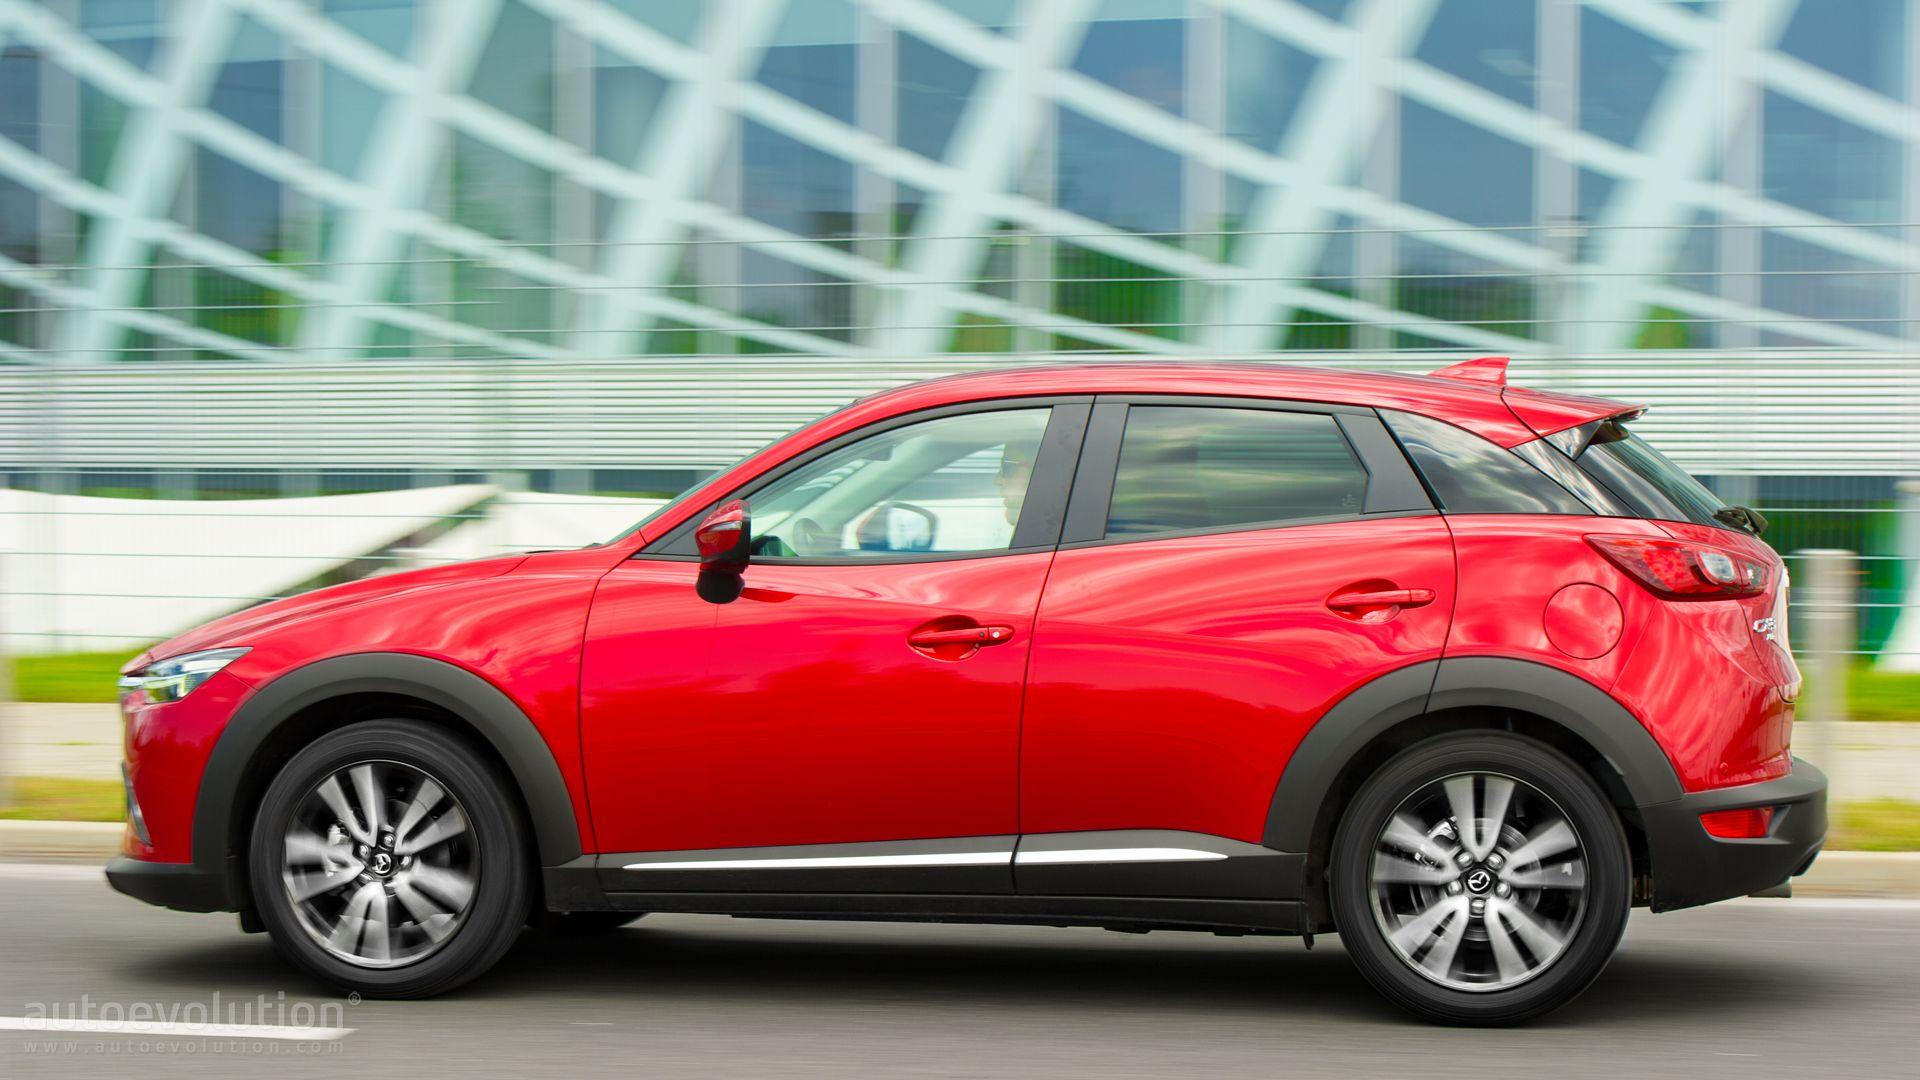 Kelebihan Mazda Cx 3 4X4 Top Model Tahun Ini